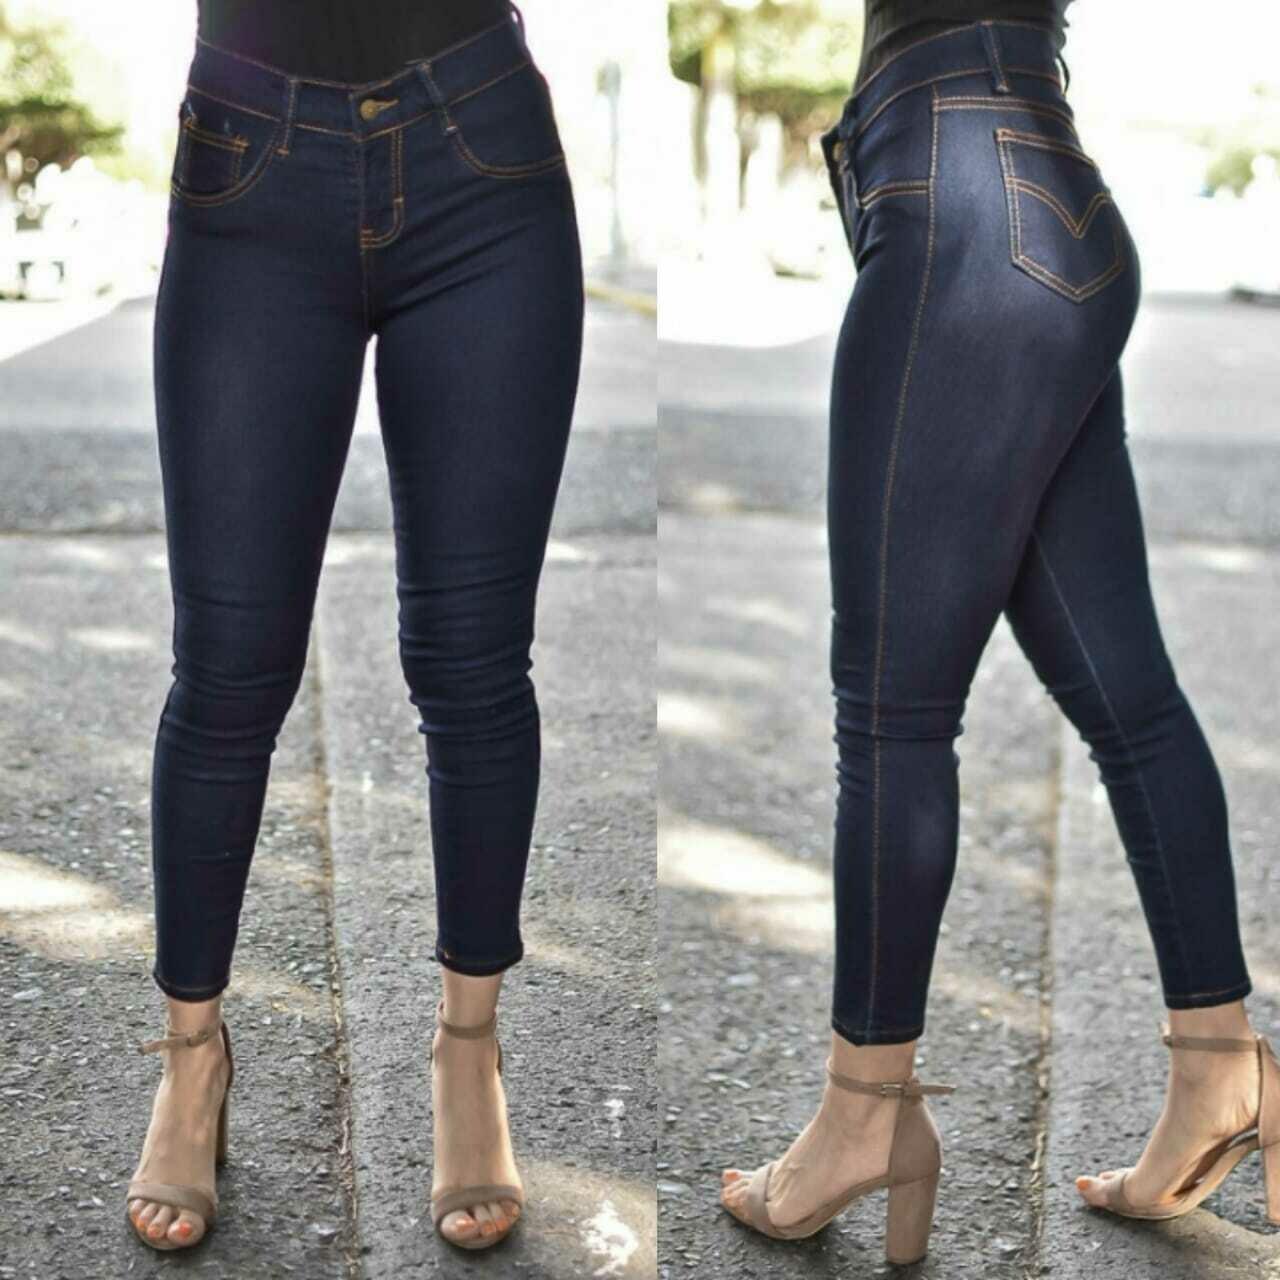 Pantalon mezclilla para dama tobillero